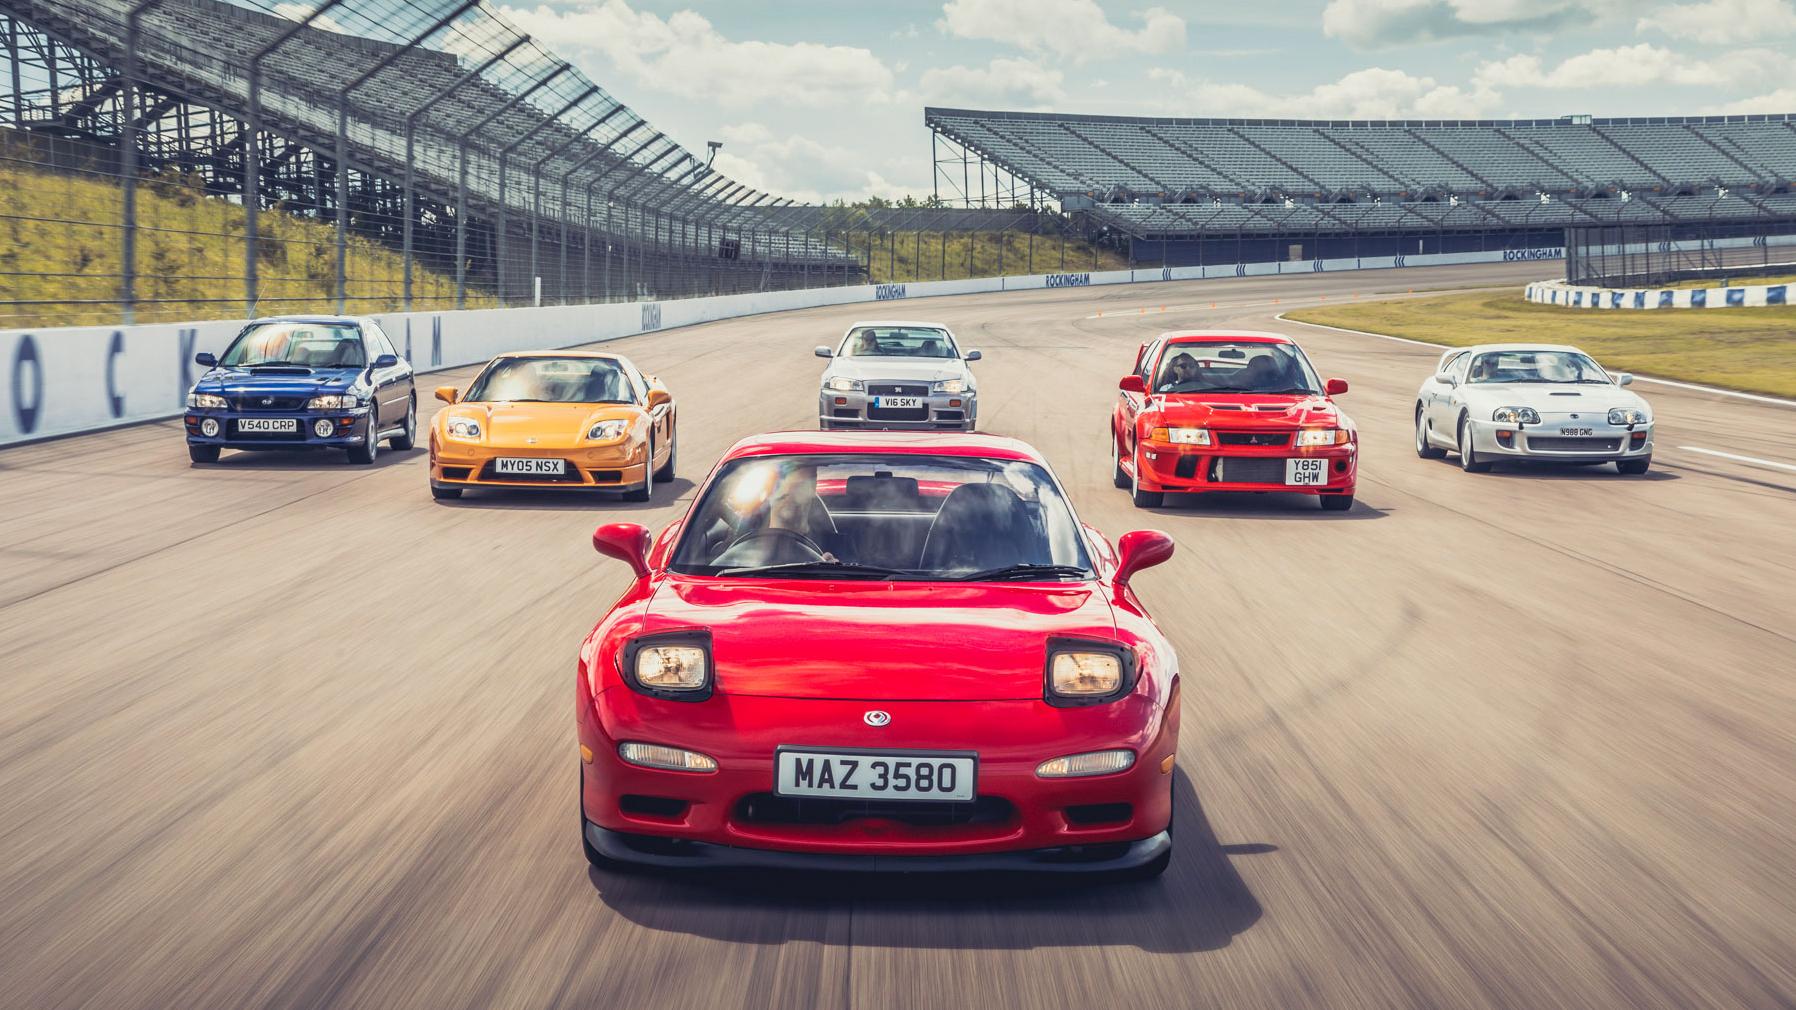 Gran Turismo cars in real life